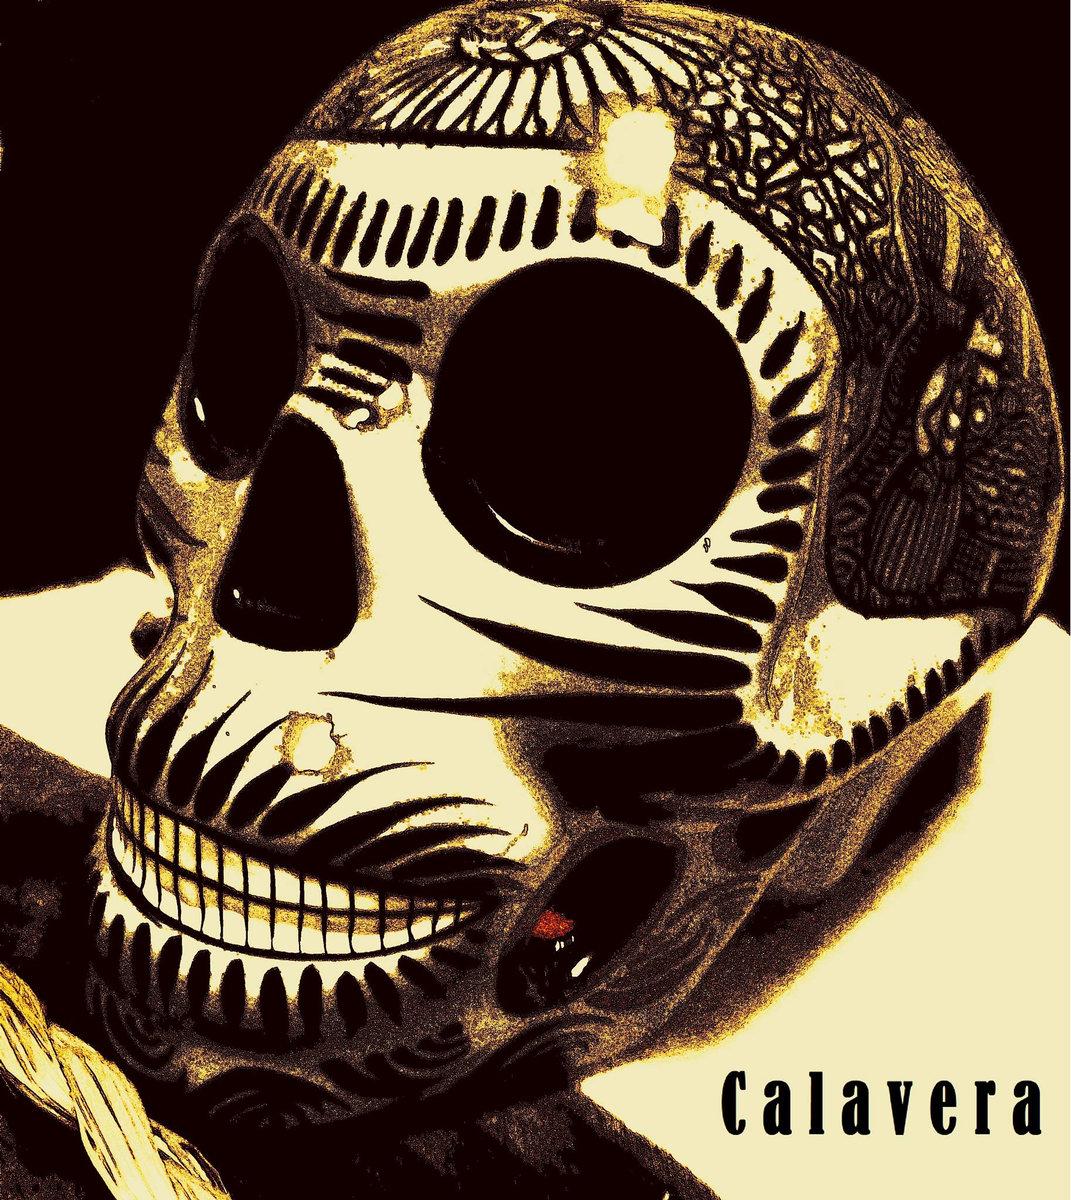 Released: September 25th, 2017   Genres: Hard rock, Latin